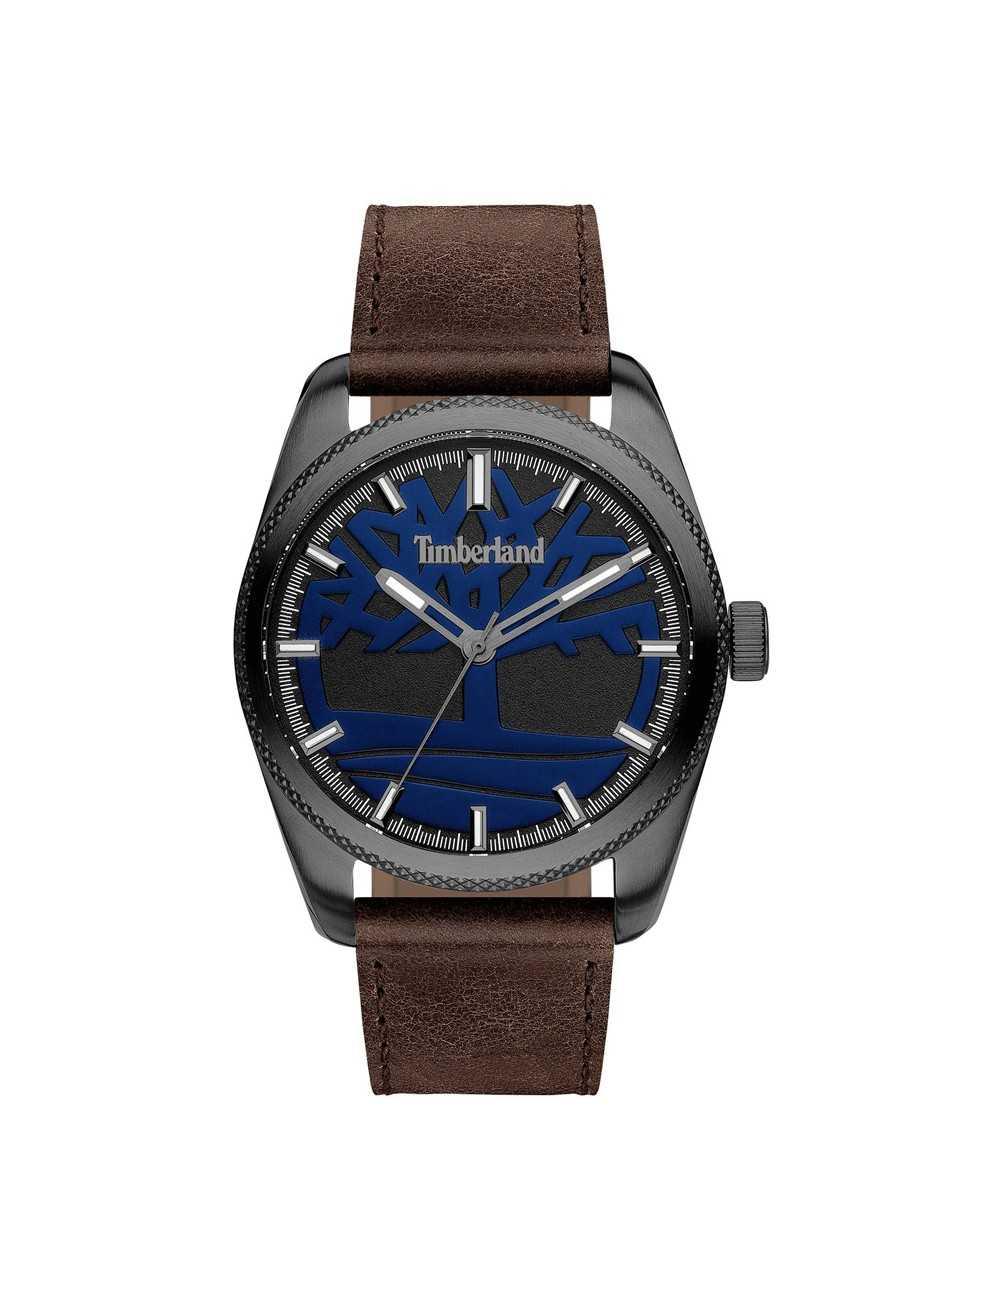 Pánske hodinky Timberland Newburgh TBL.15577JSU / 03